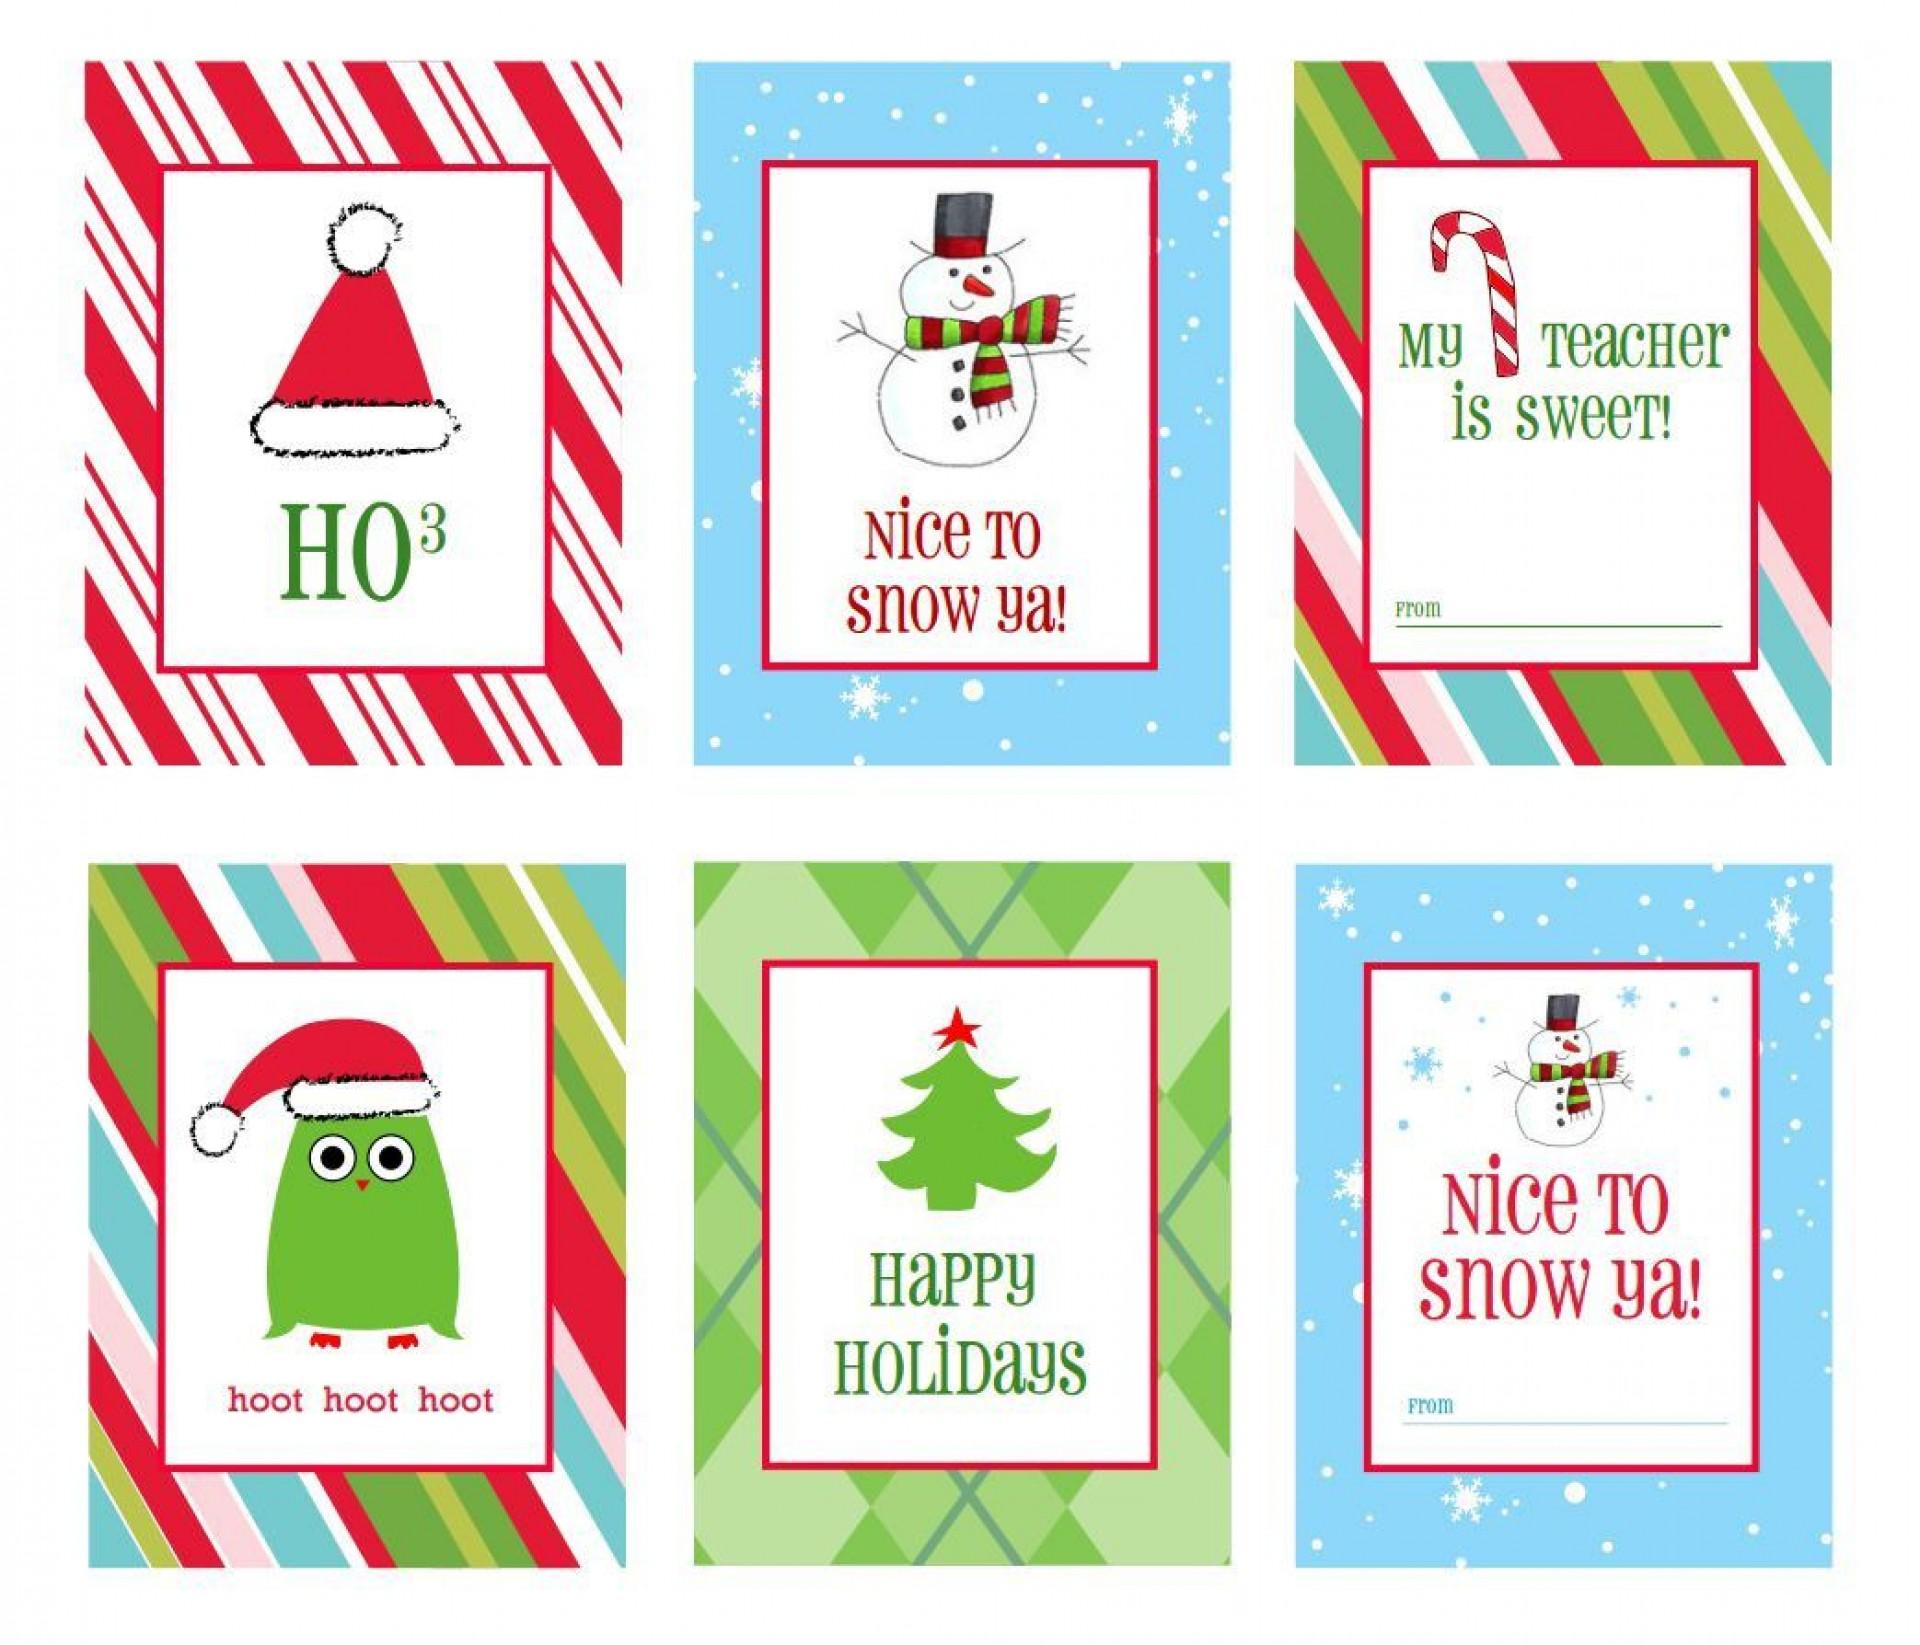 005 Sensational Printable Christma Gift Tag Template Concept  Templates Free Holiday For Word1920